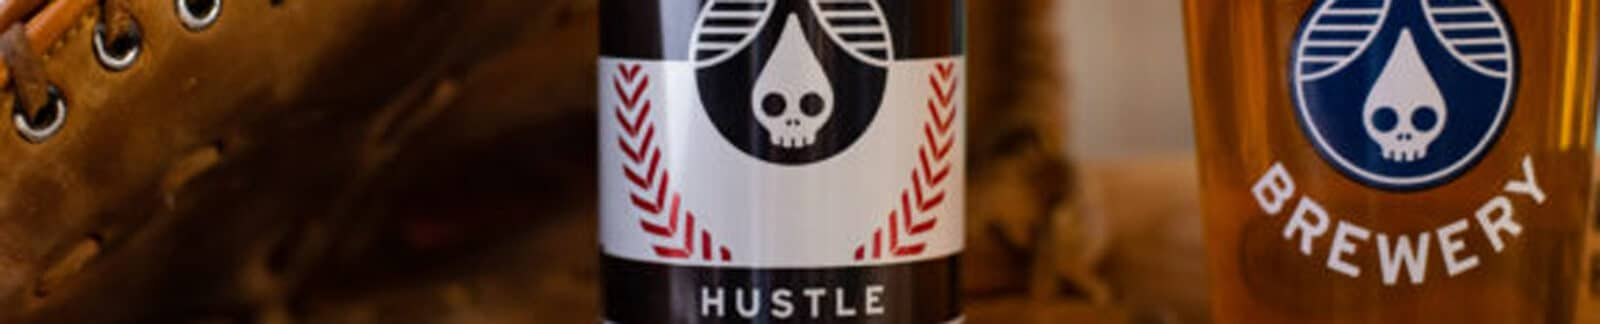 Hustle IPA header